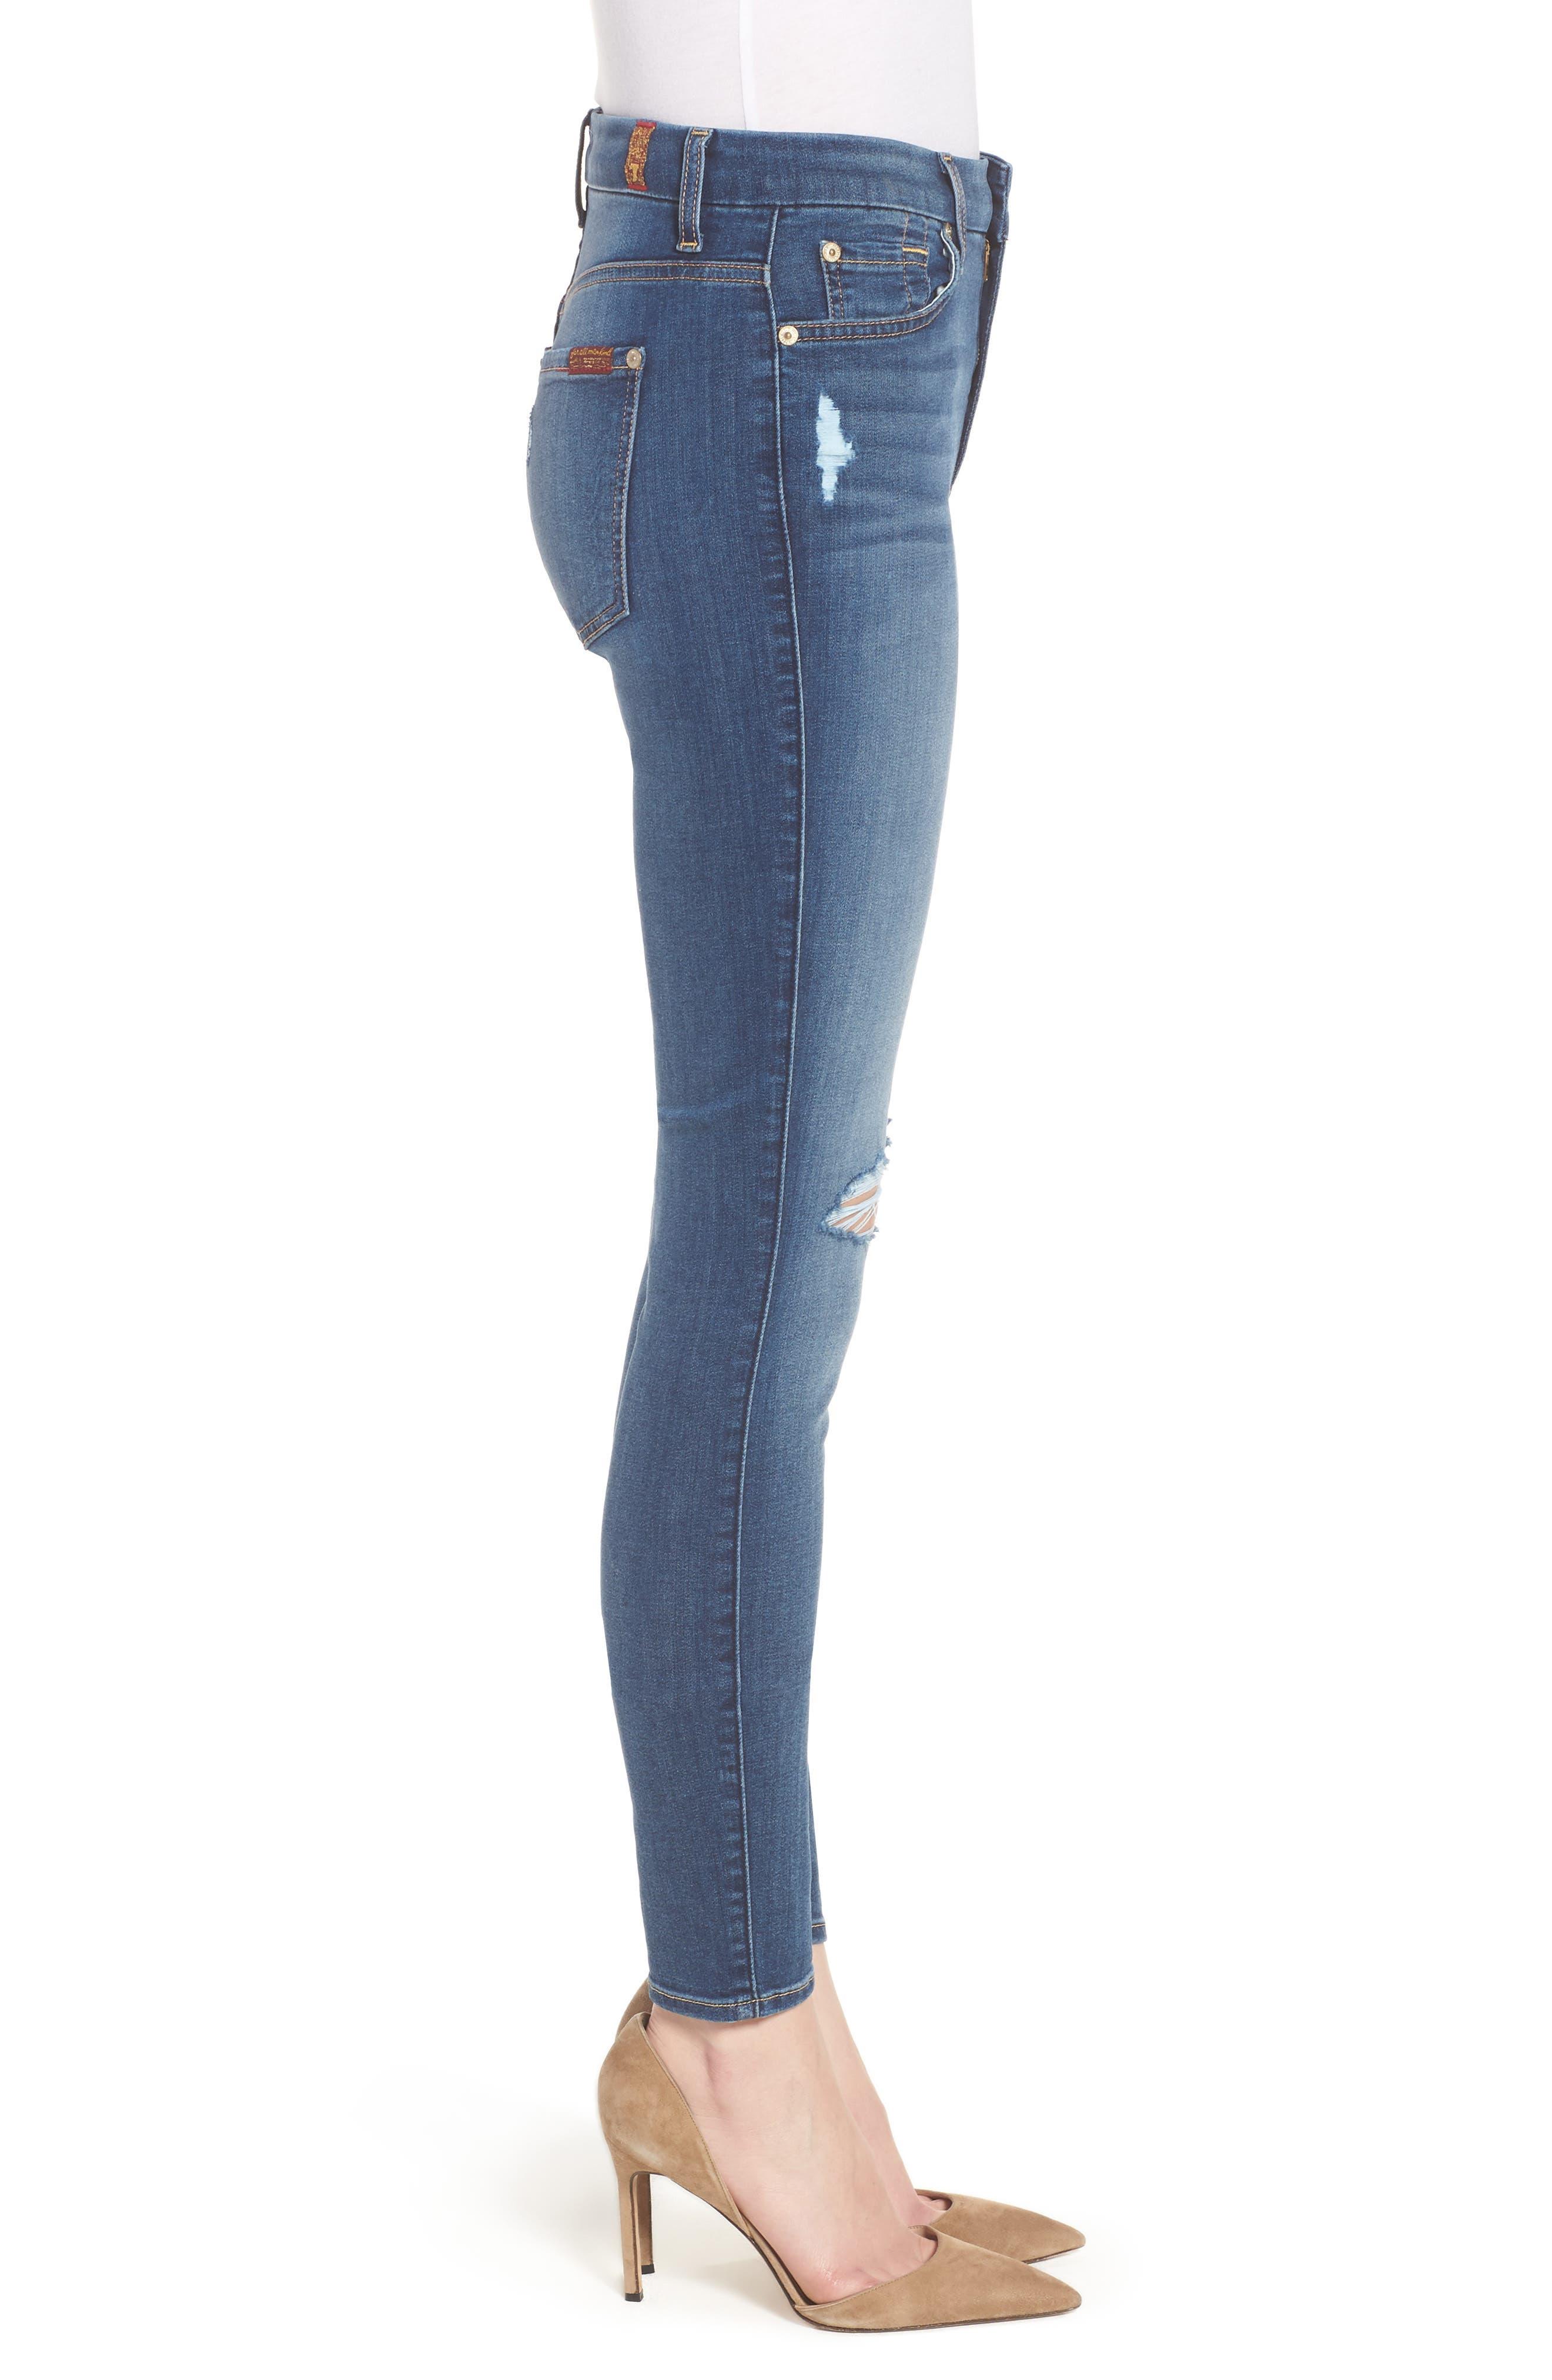 'b(air) - The Ankle' Skinny Jeans,                             Alternate thumbnail 3, color,                             Bair Vintage Dusk 2